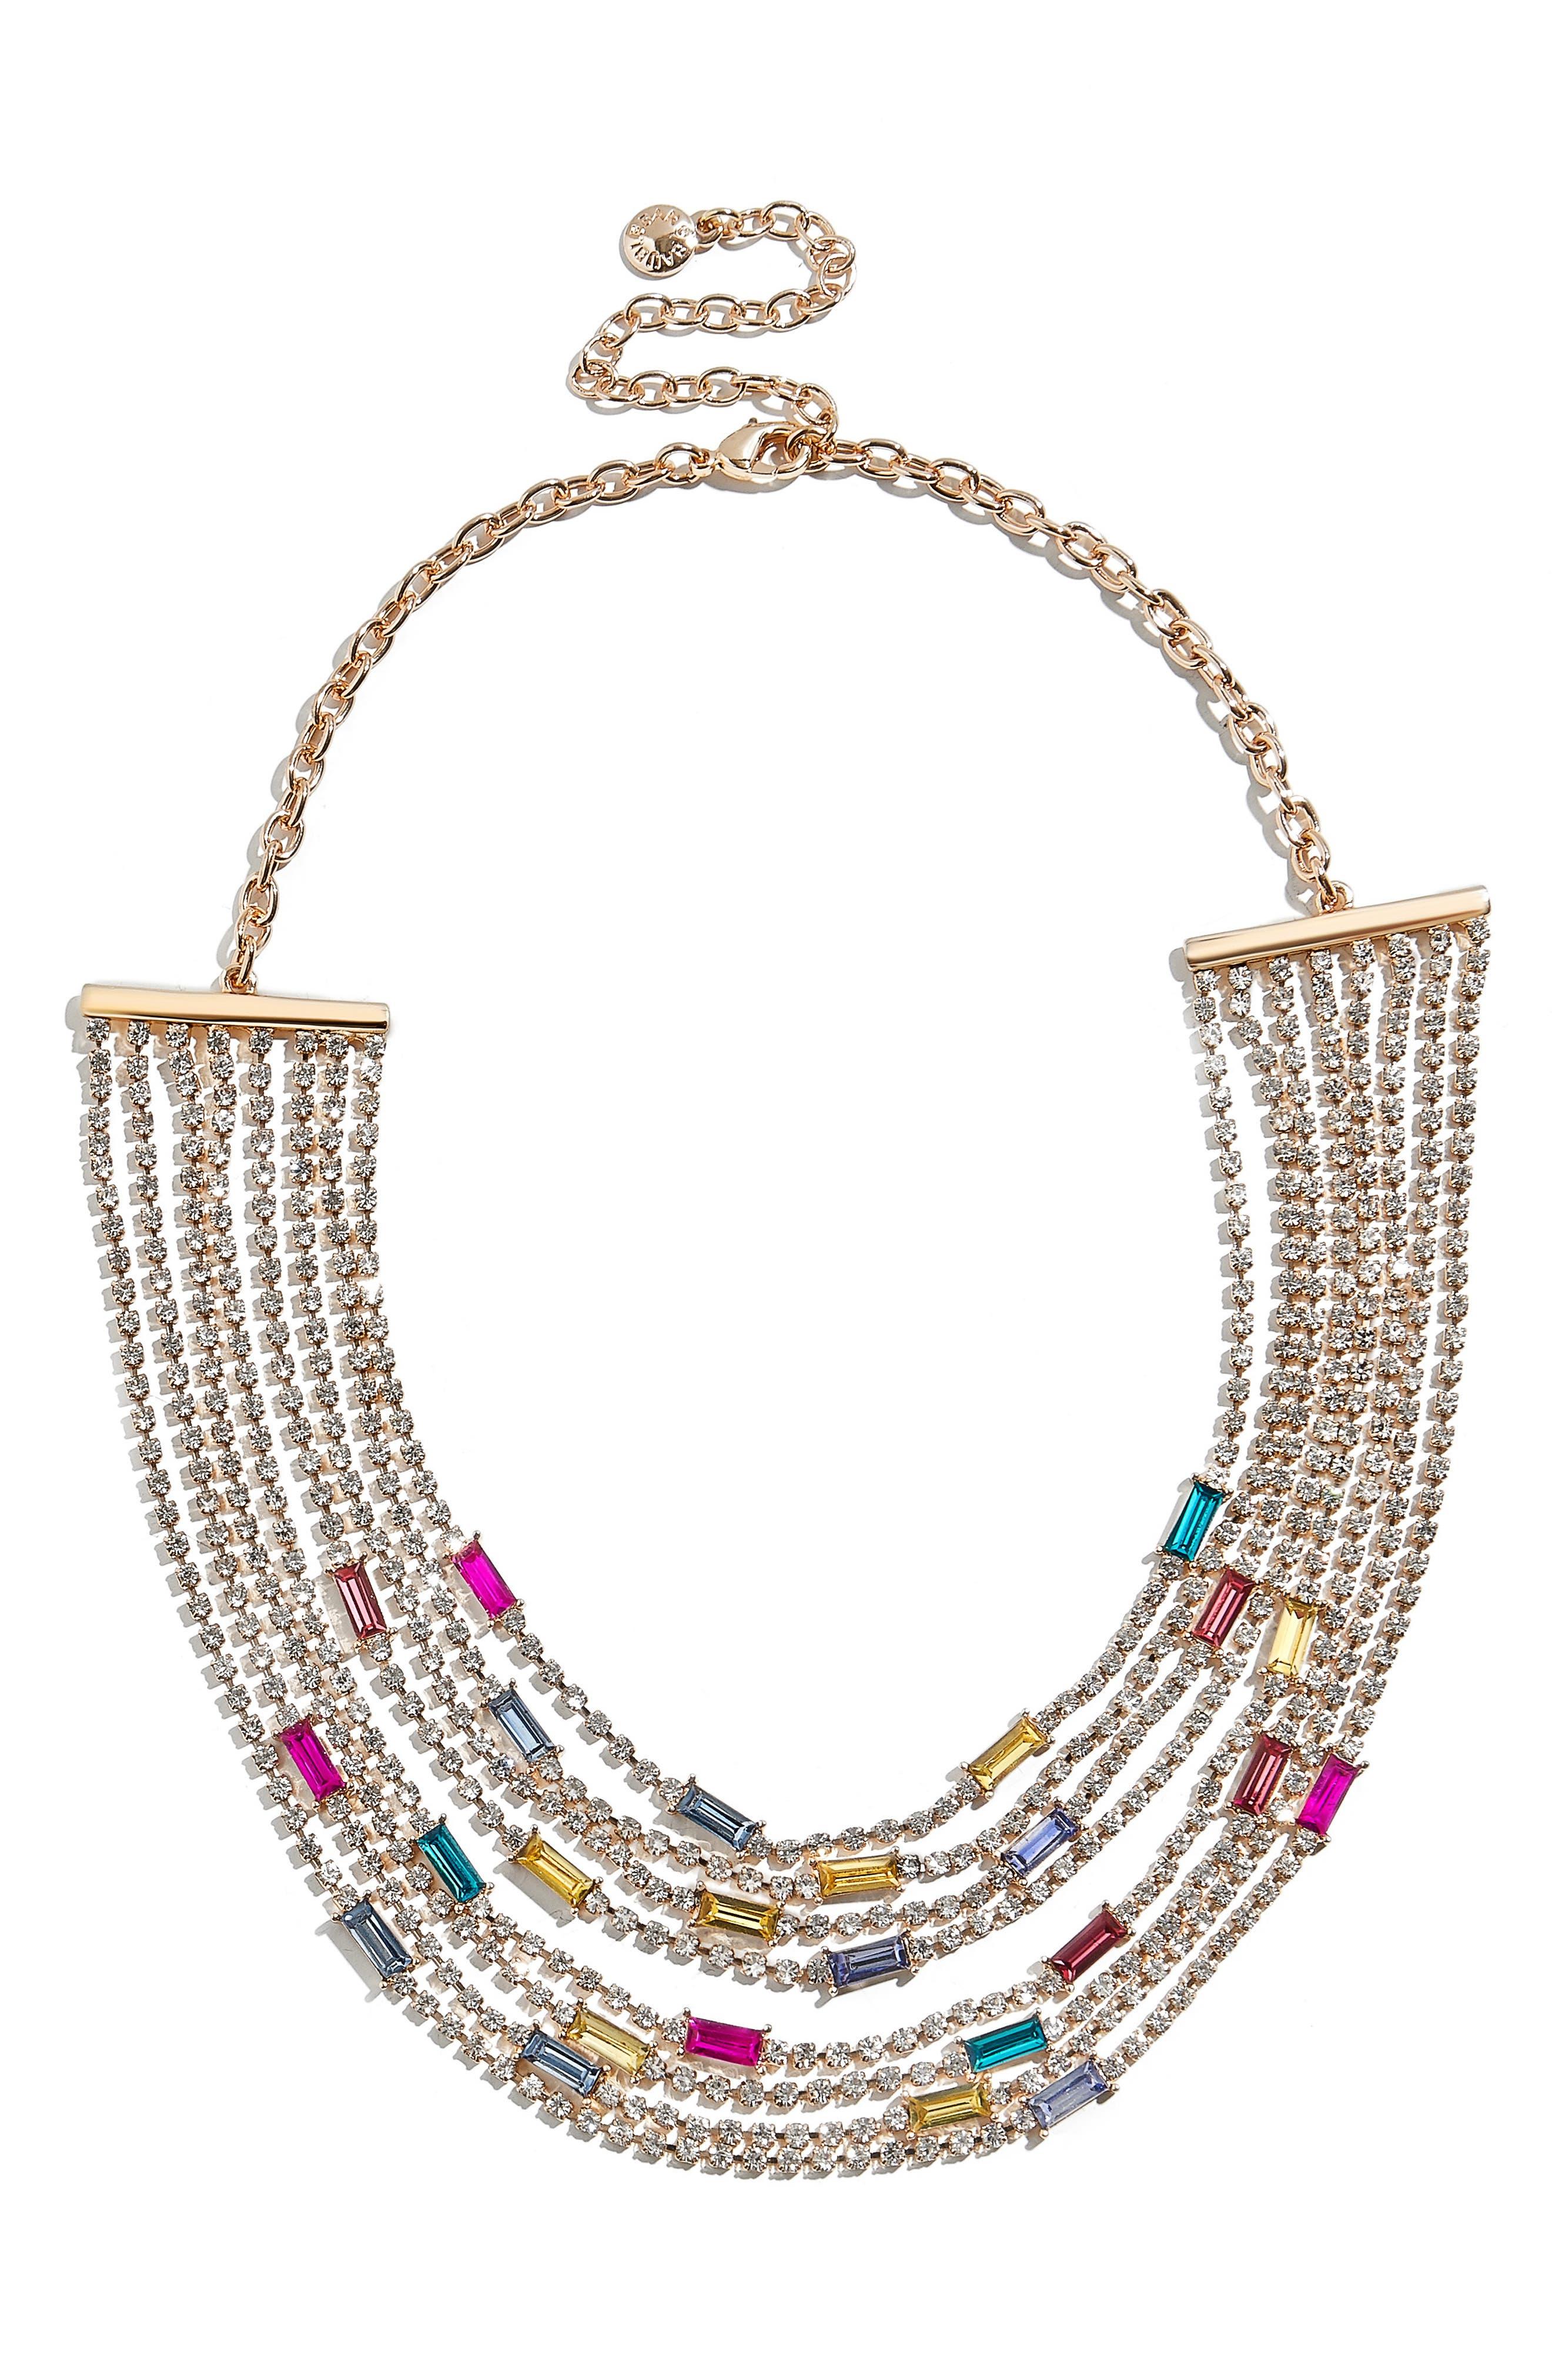 x Micaela Erlanger Bright Lights, Big City Statement Necklace,                             Main thumbnail 1, color,                             MULTI/ GOLD